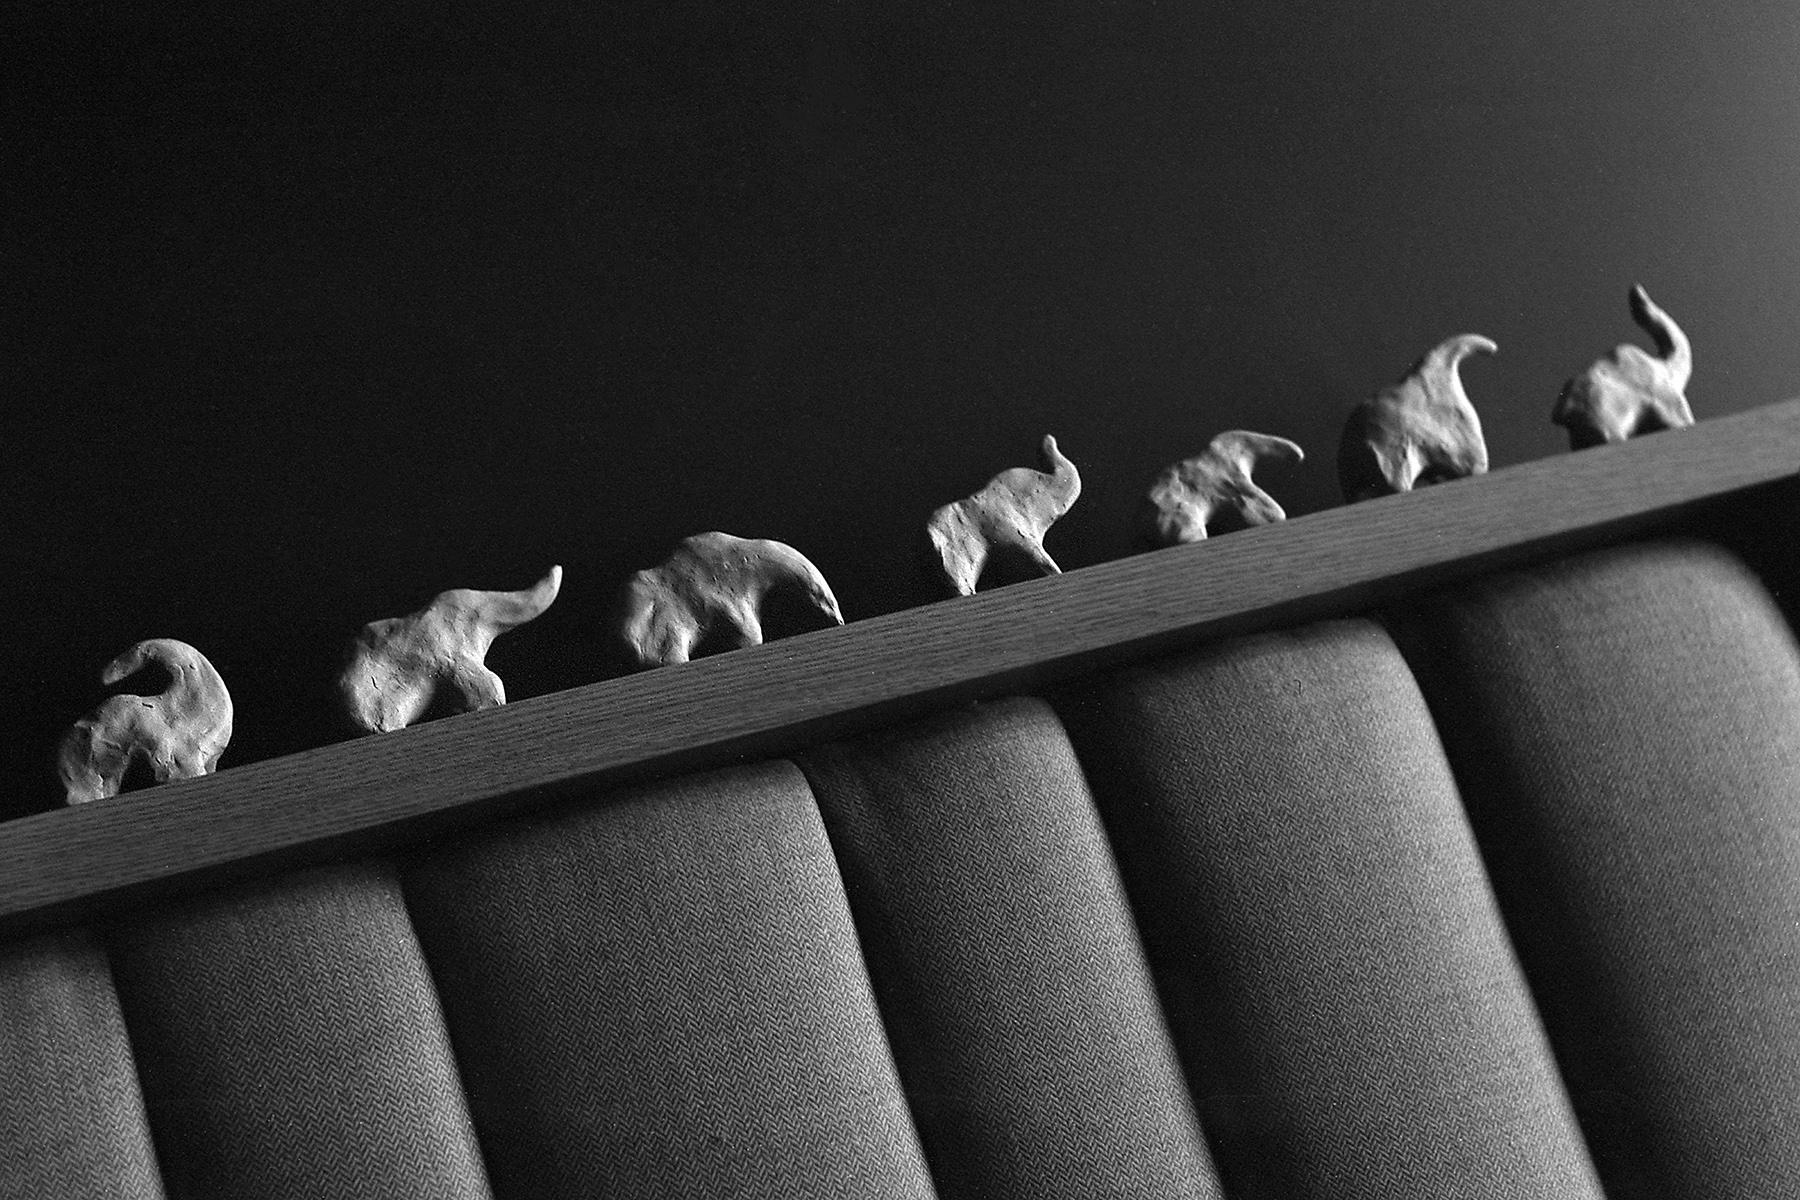 Howard Sandler - Figurines_Praktica LTL_Pentacon 50mm_Acros_Howard Sandler.jpg